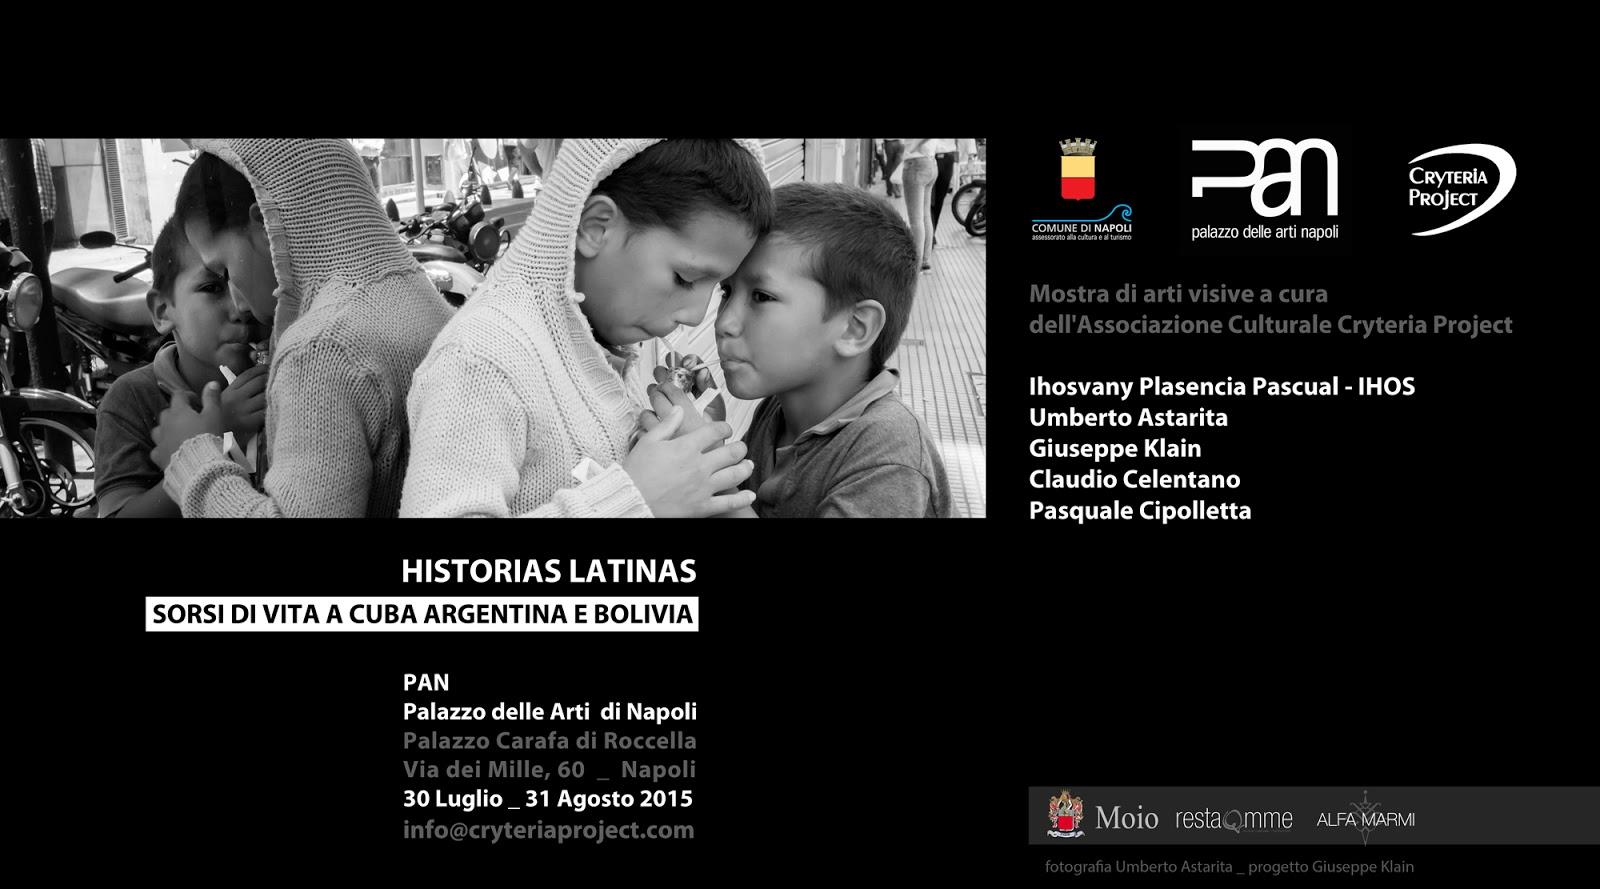 HISTORIAS LATINAS Sorsi di vita a Cuba Argentina e Bolivia